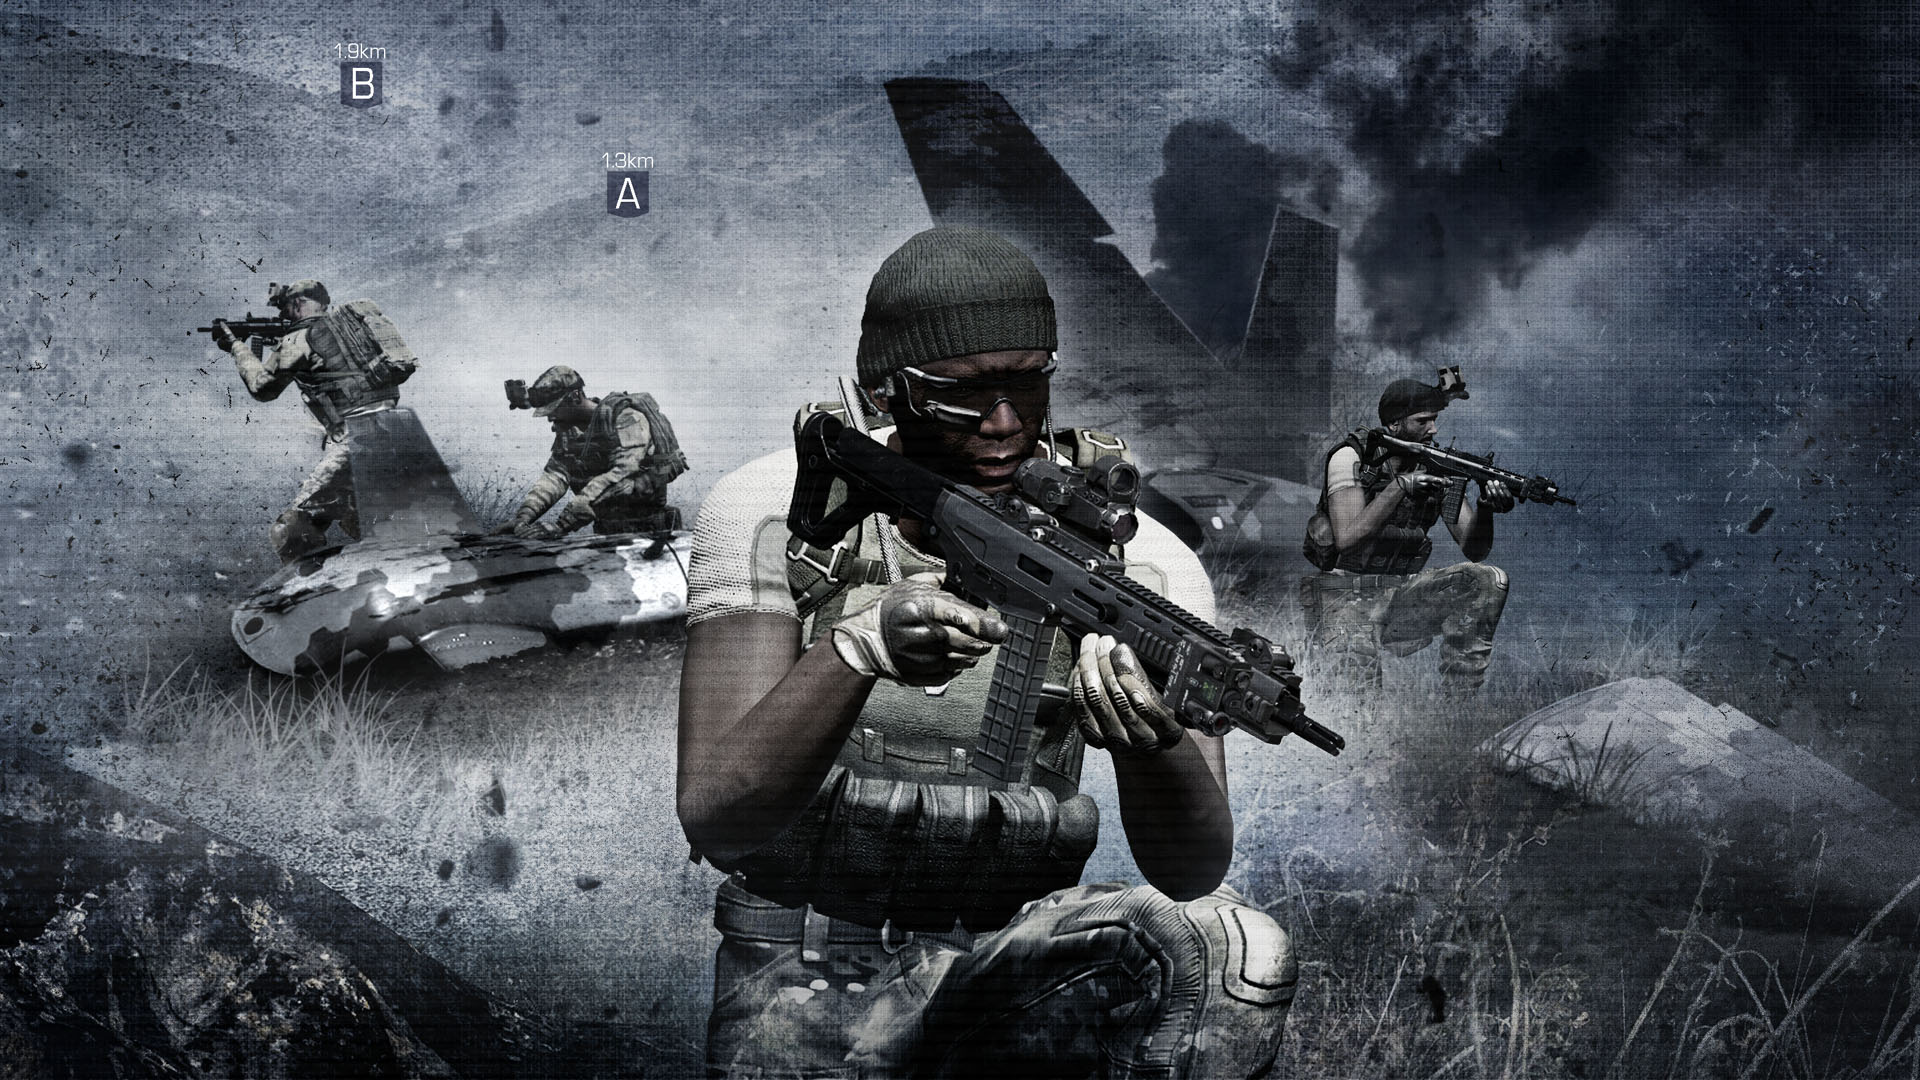 wallpapers arma 3